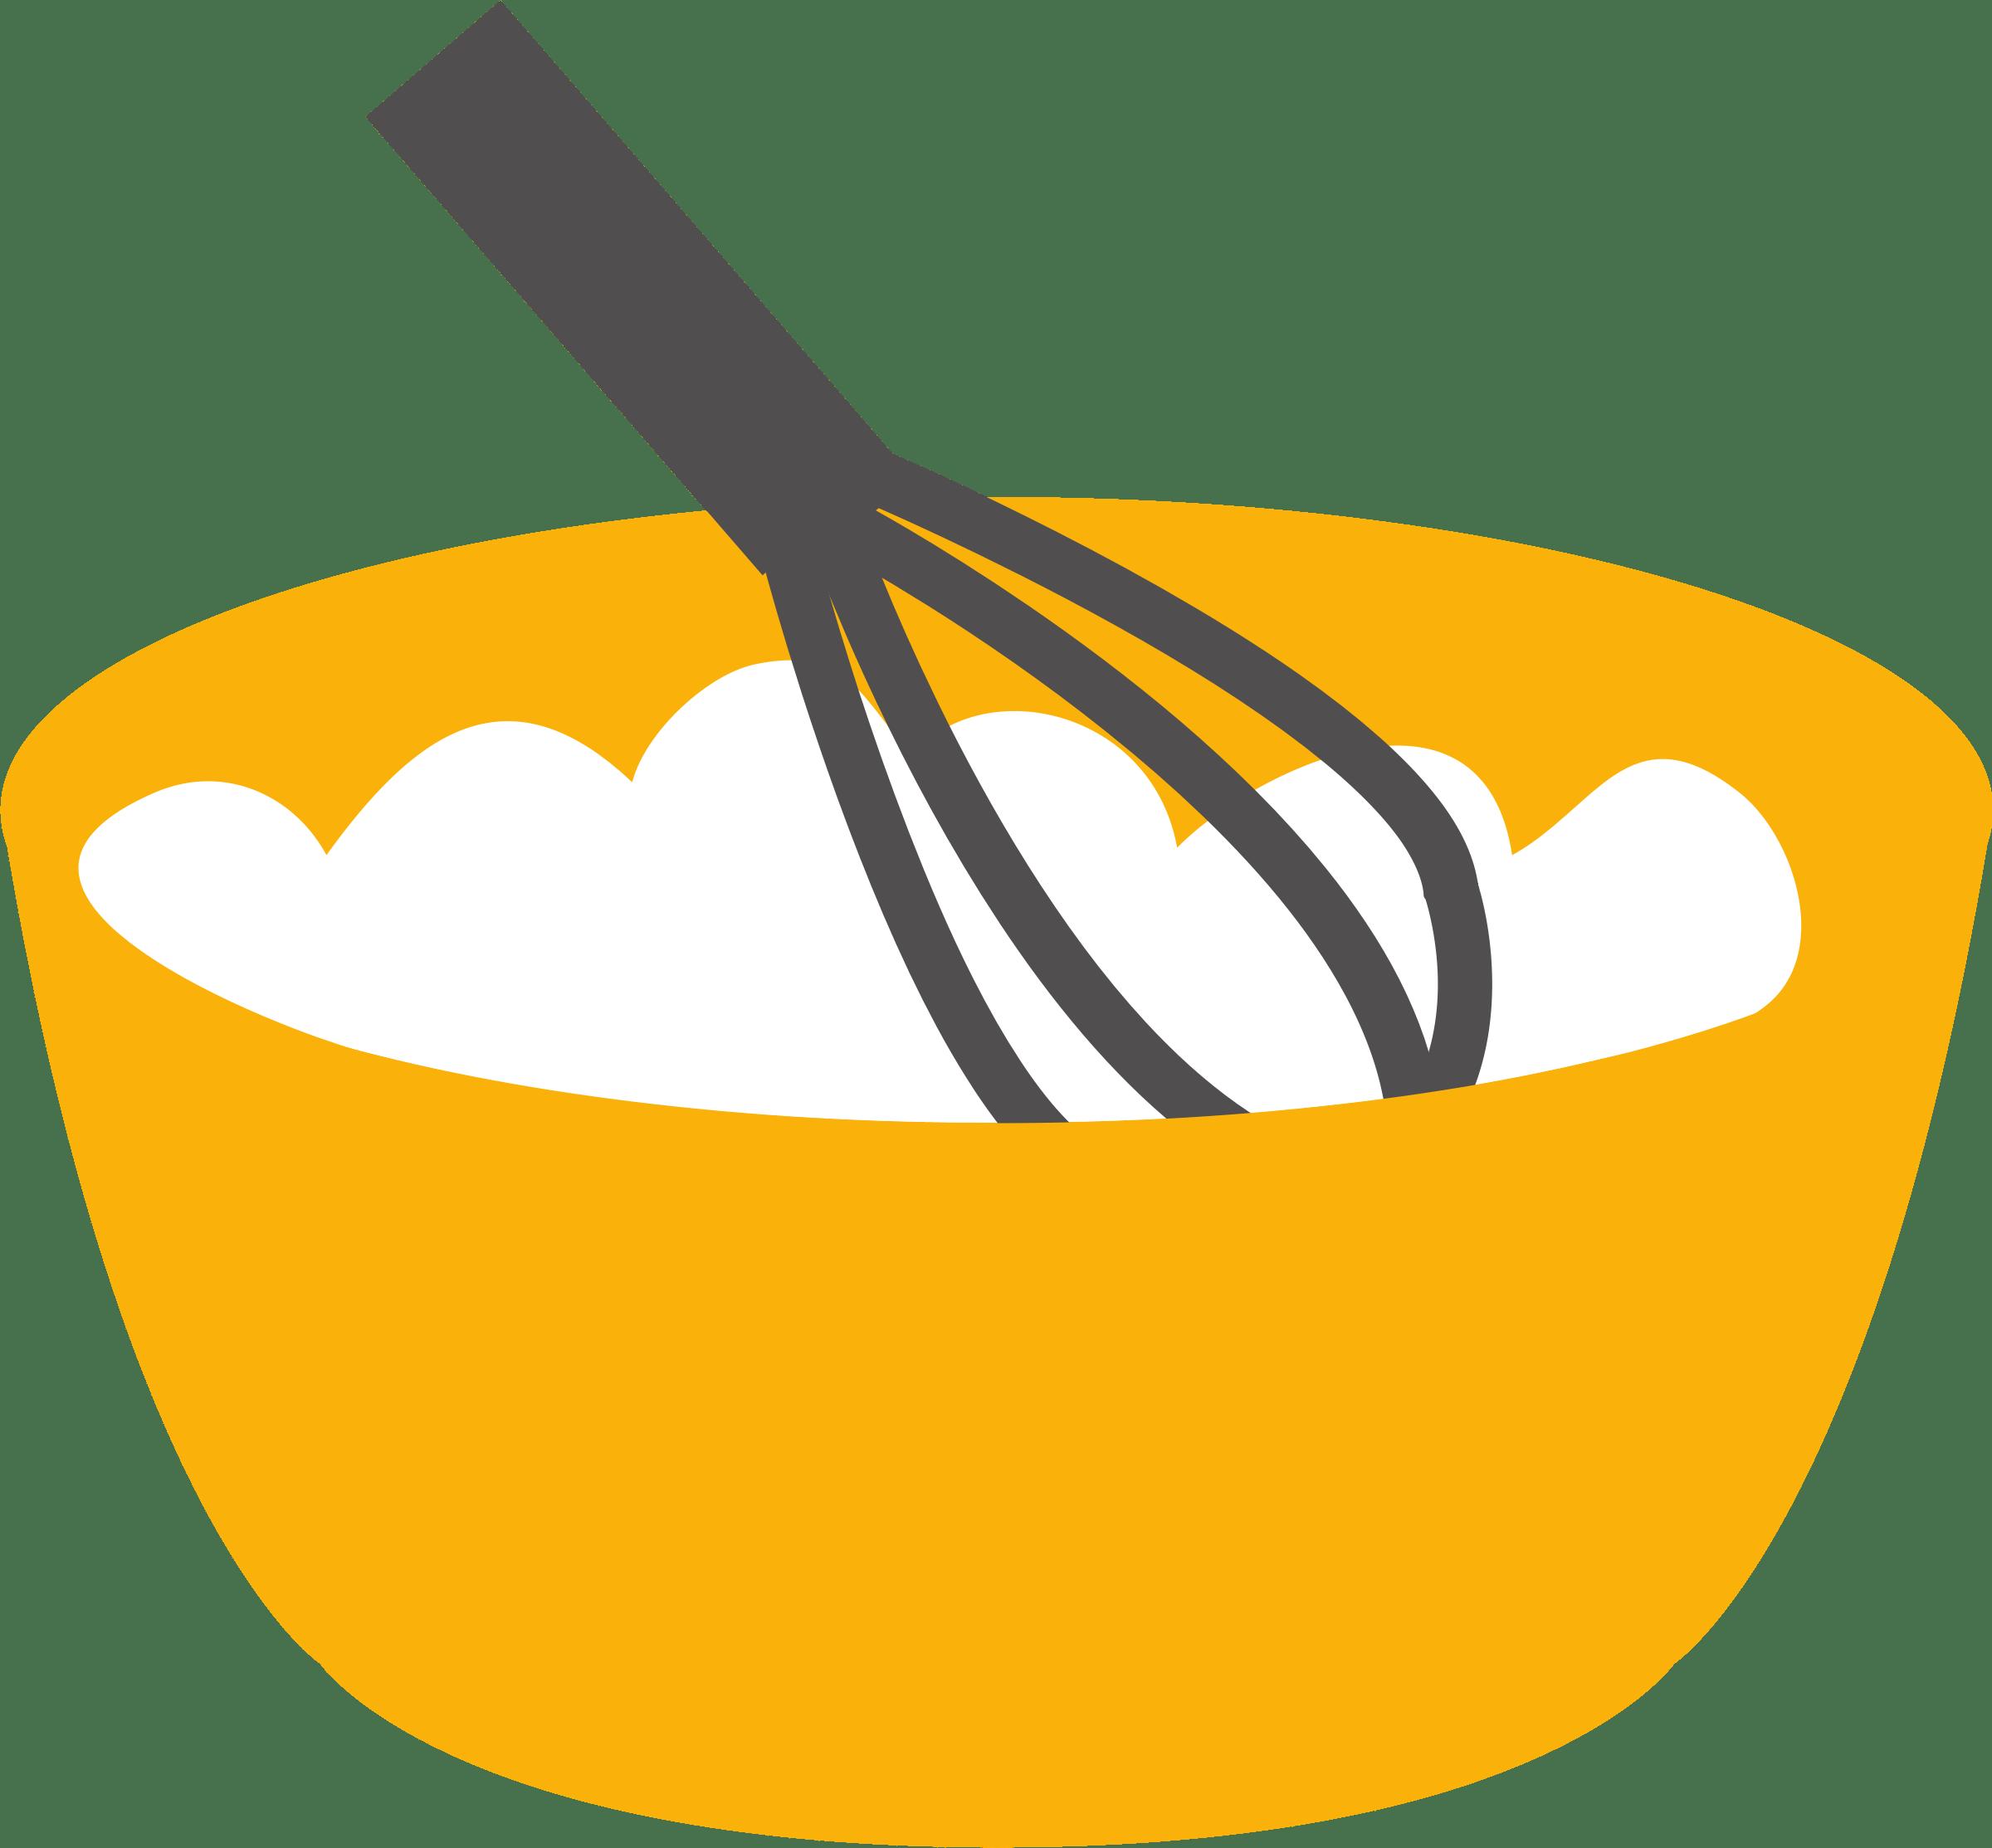 clip art details mixing bowl clipart png transparent png full size clipart 81053 pinclipart mixing bowl clipart png transparent png